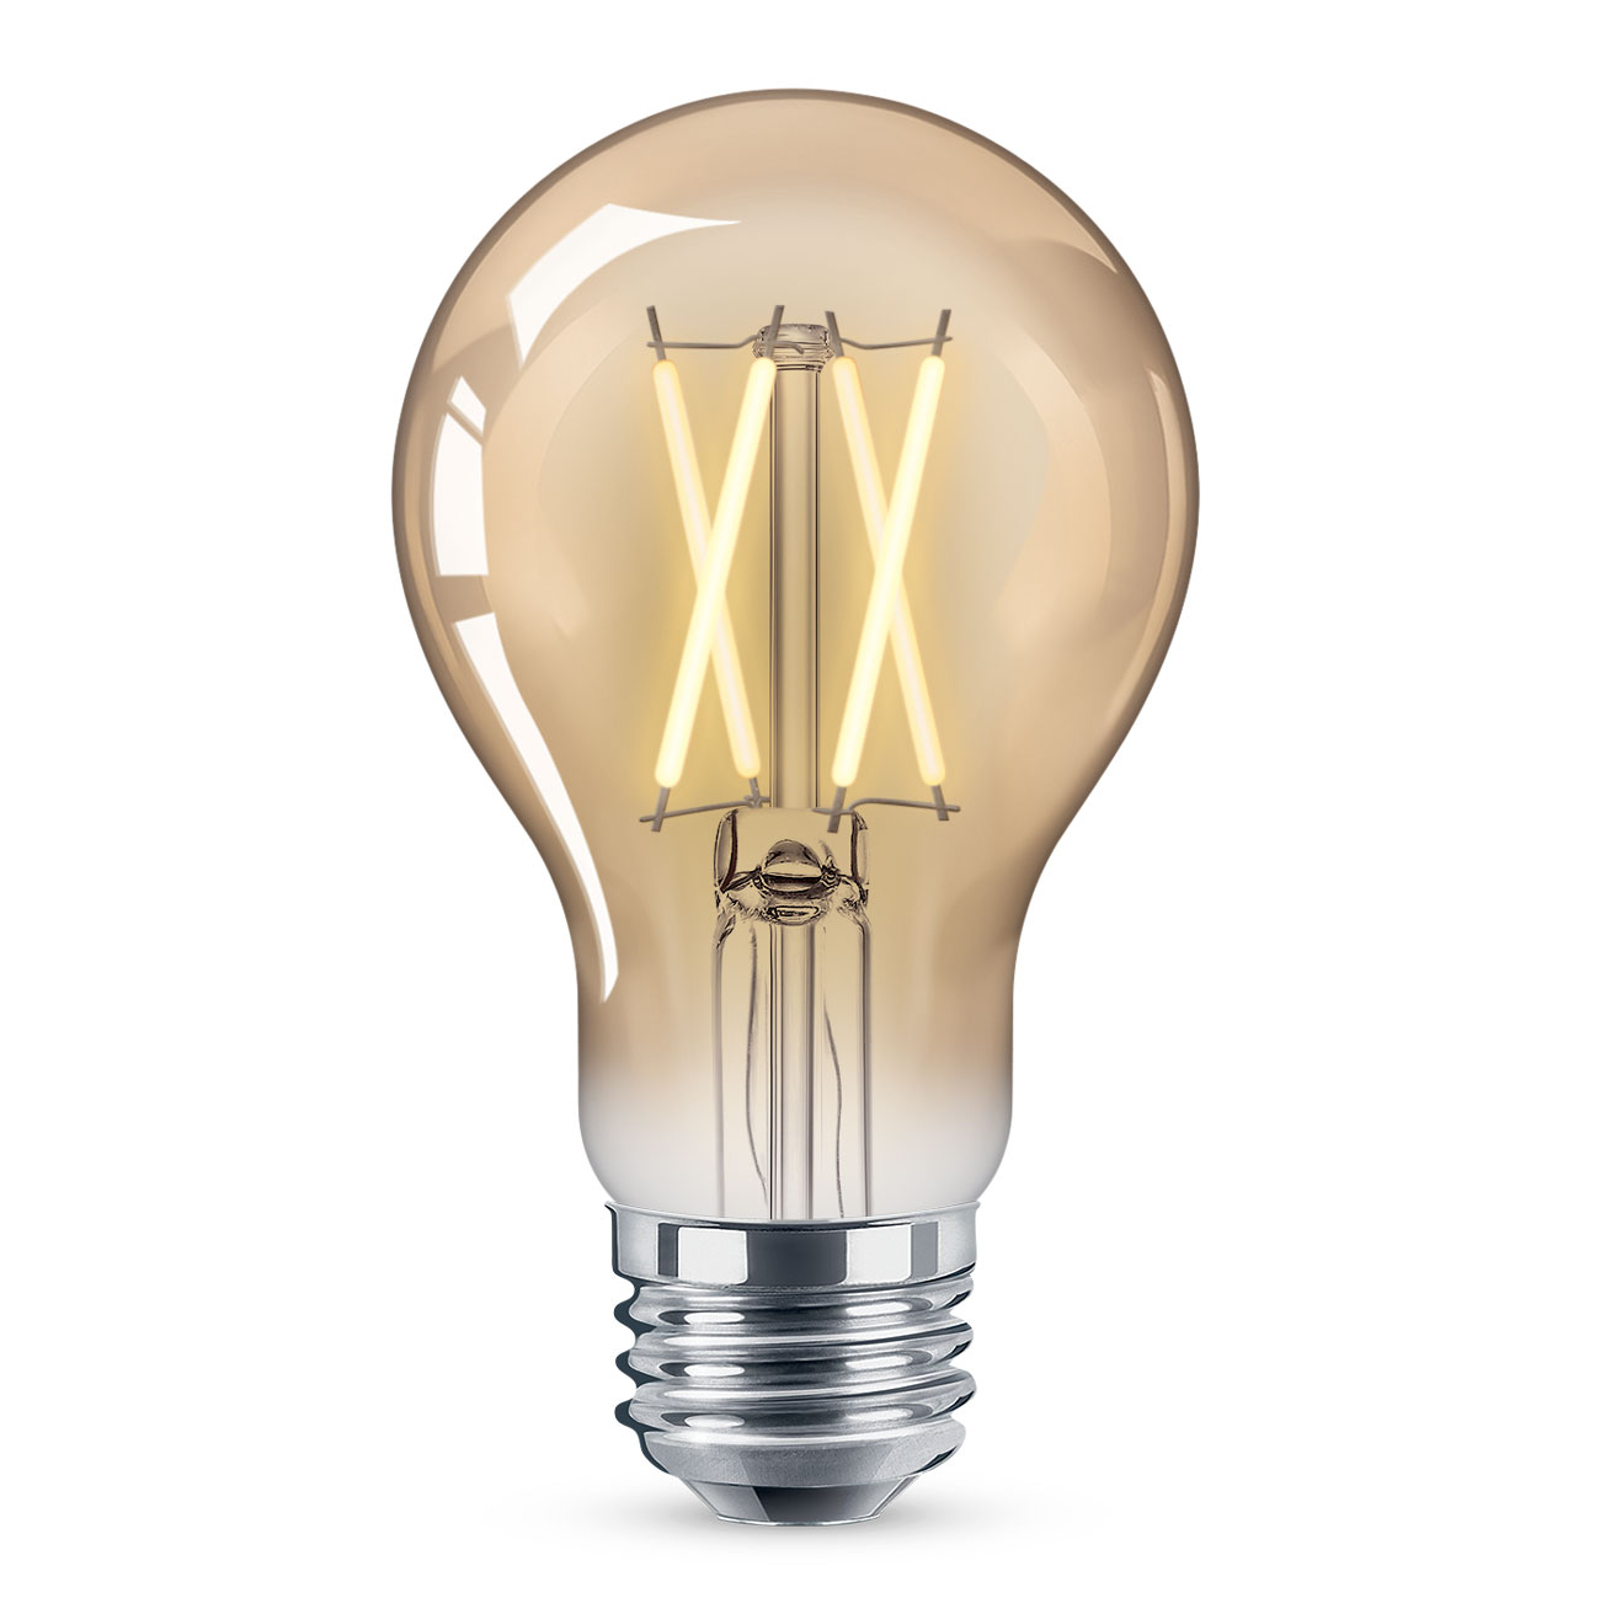 WiZ E27 LED A60 filament ambre 6,5W 2000-4500K